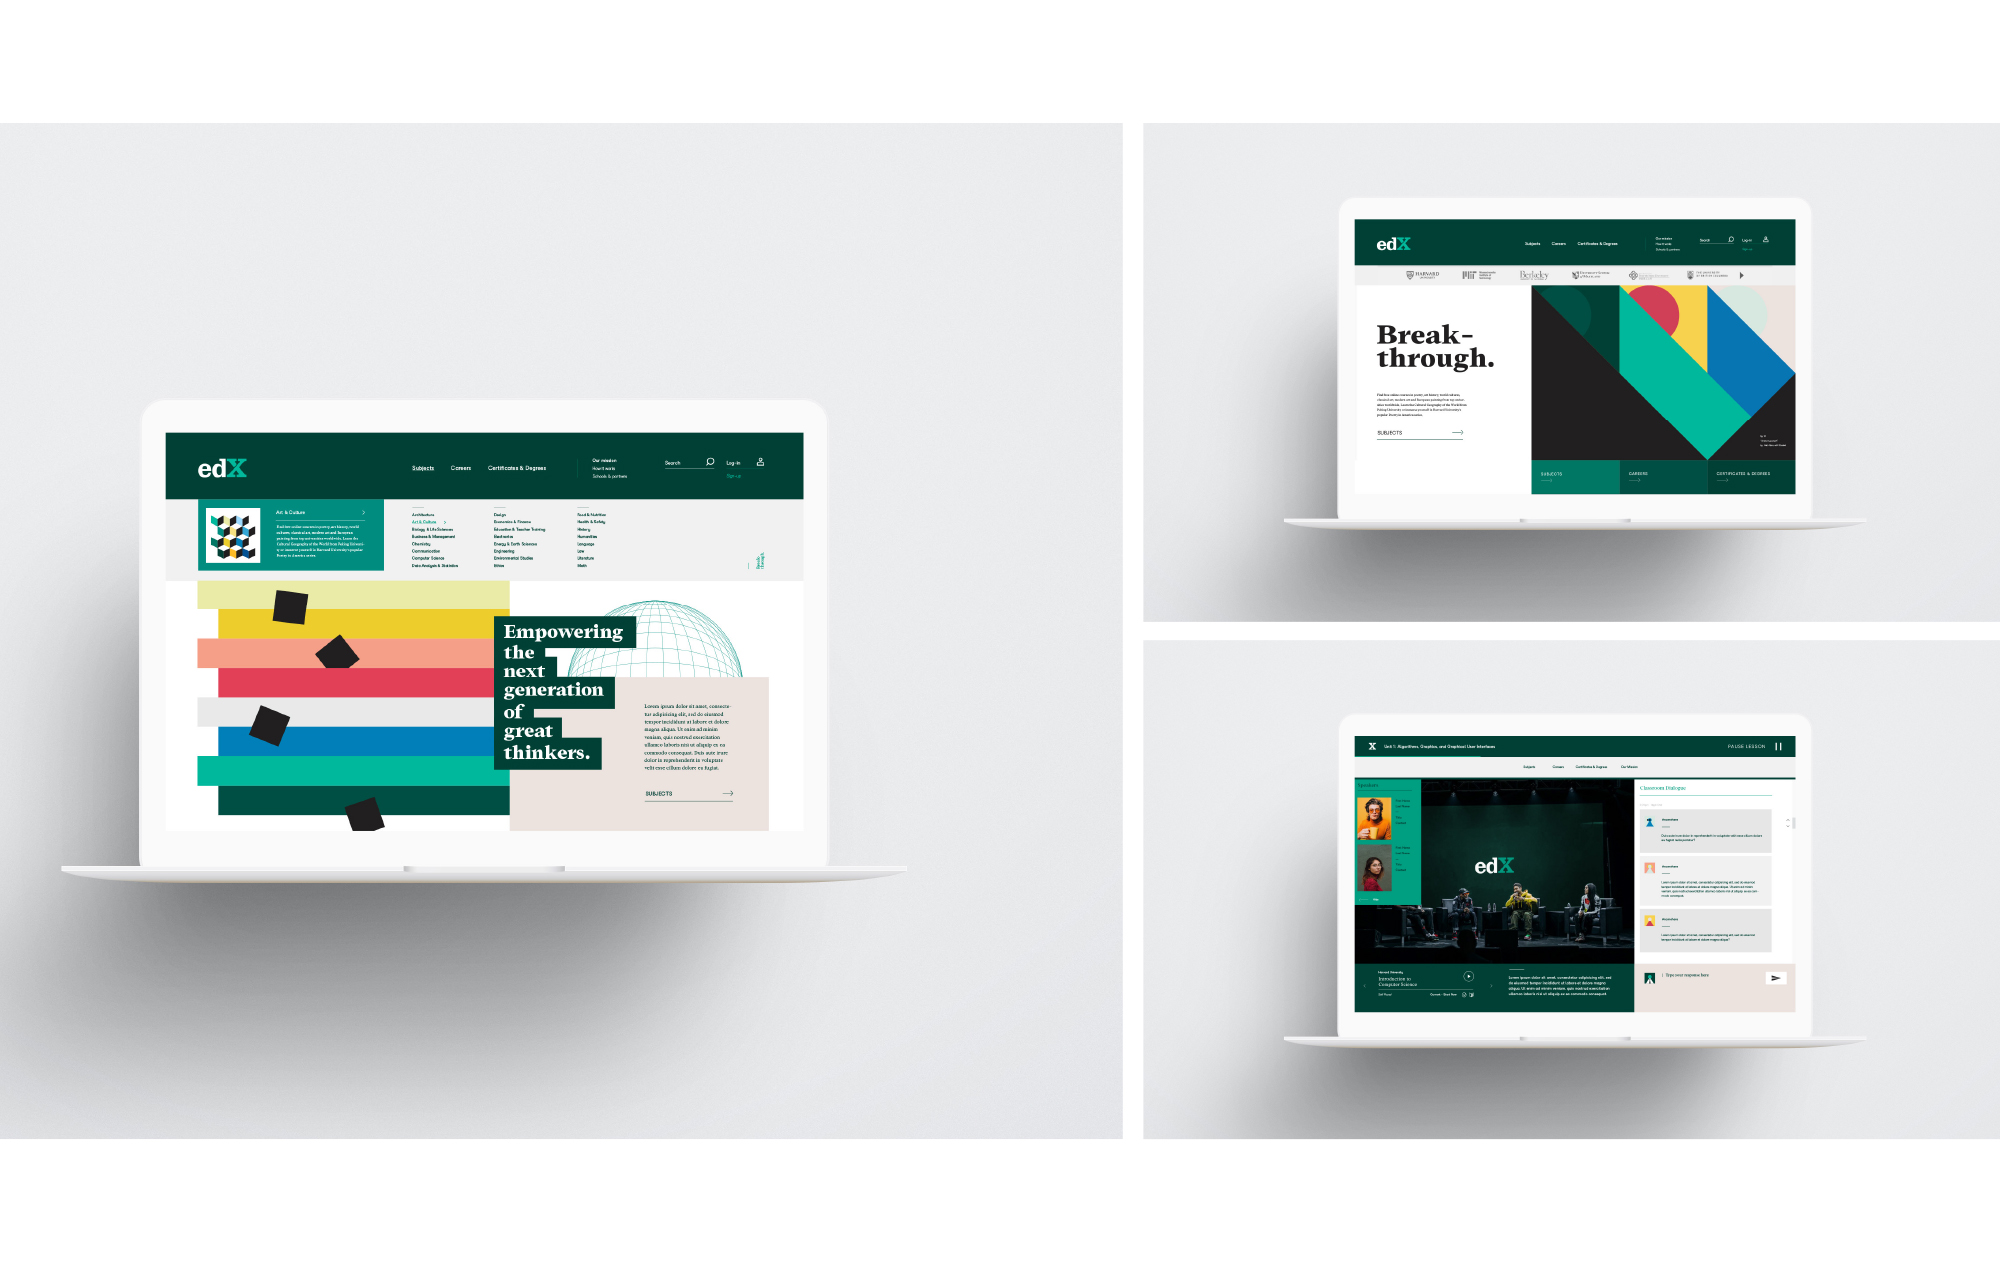 Online education desktop experience